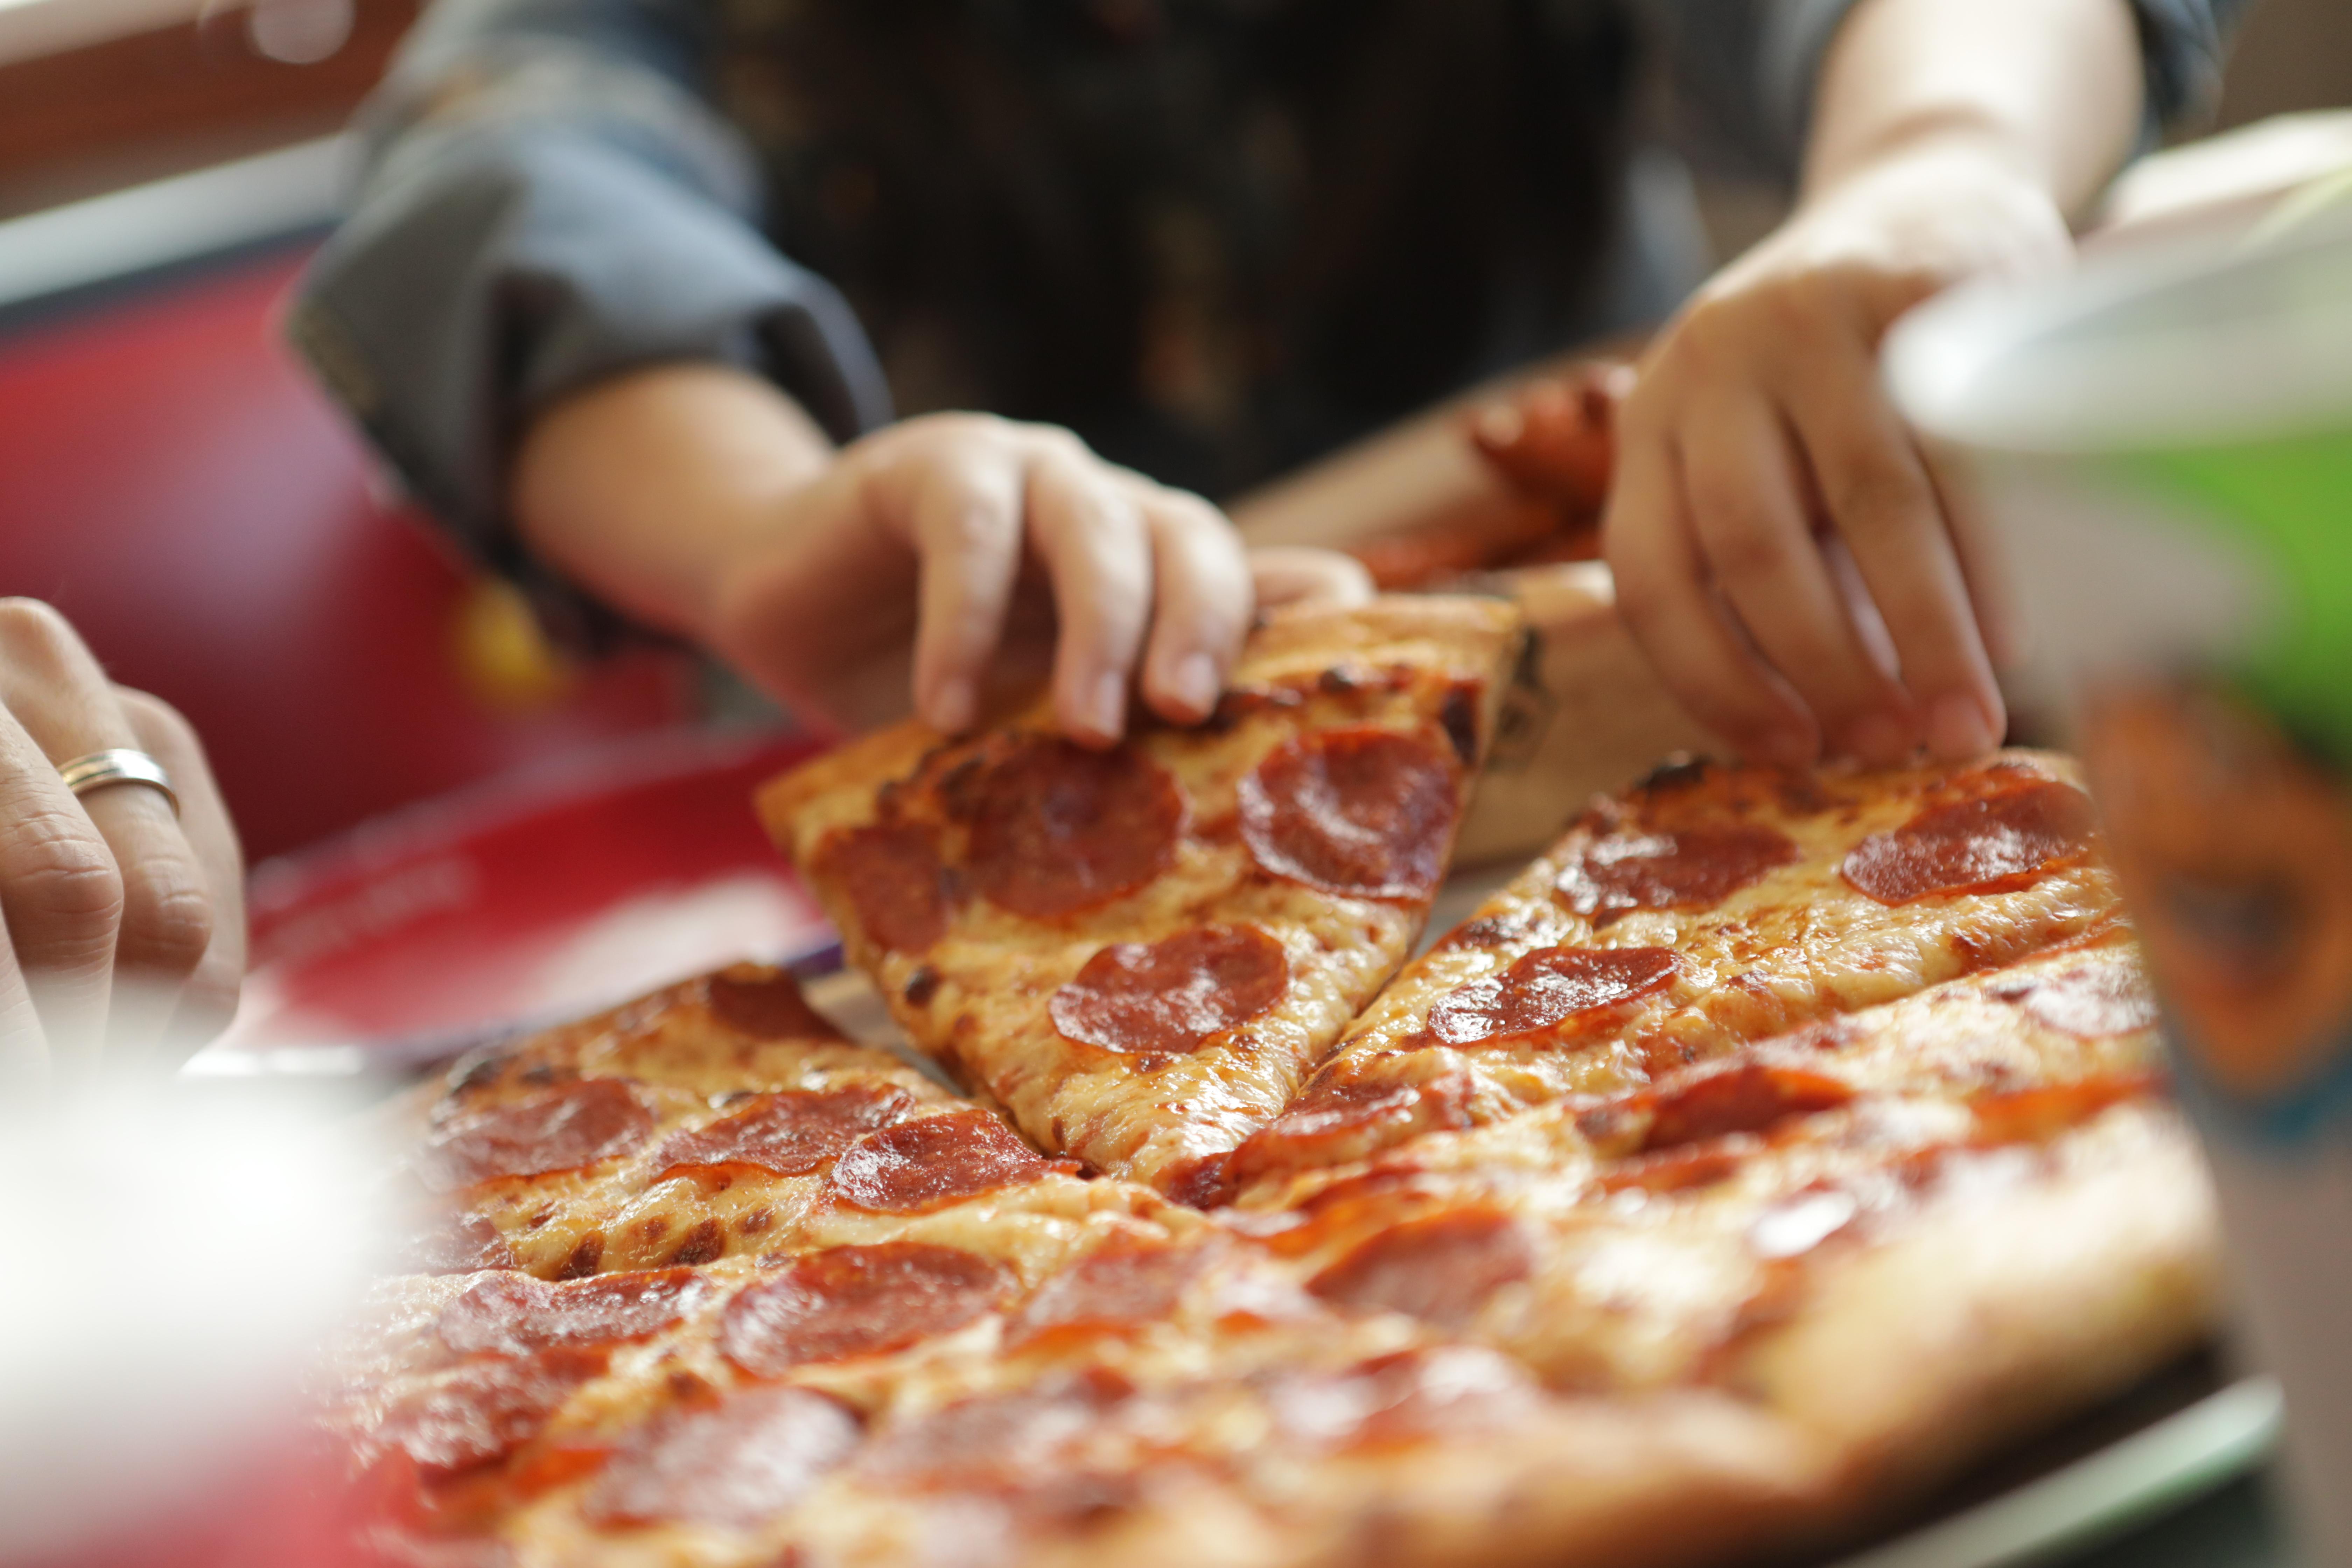 Hands grabbing pizza